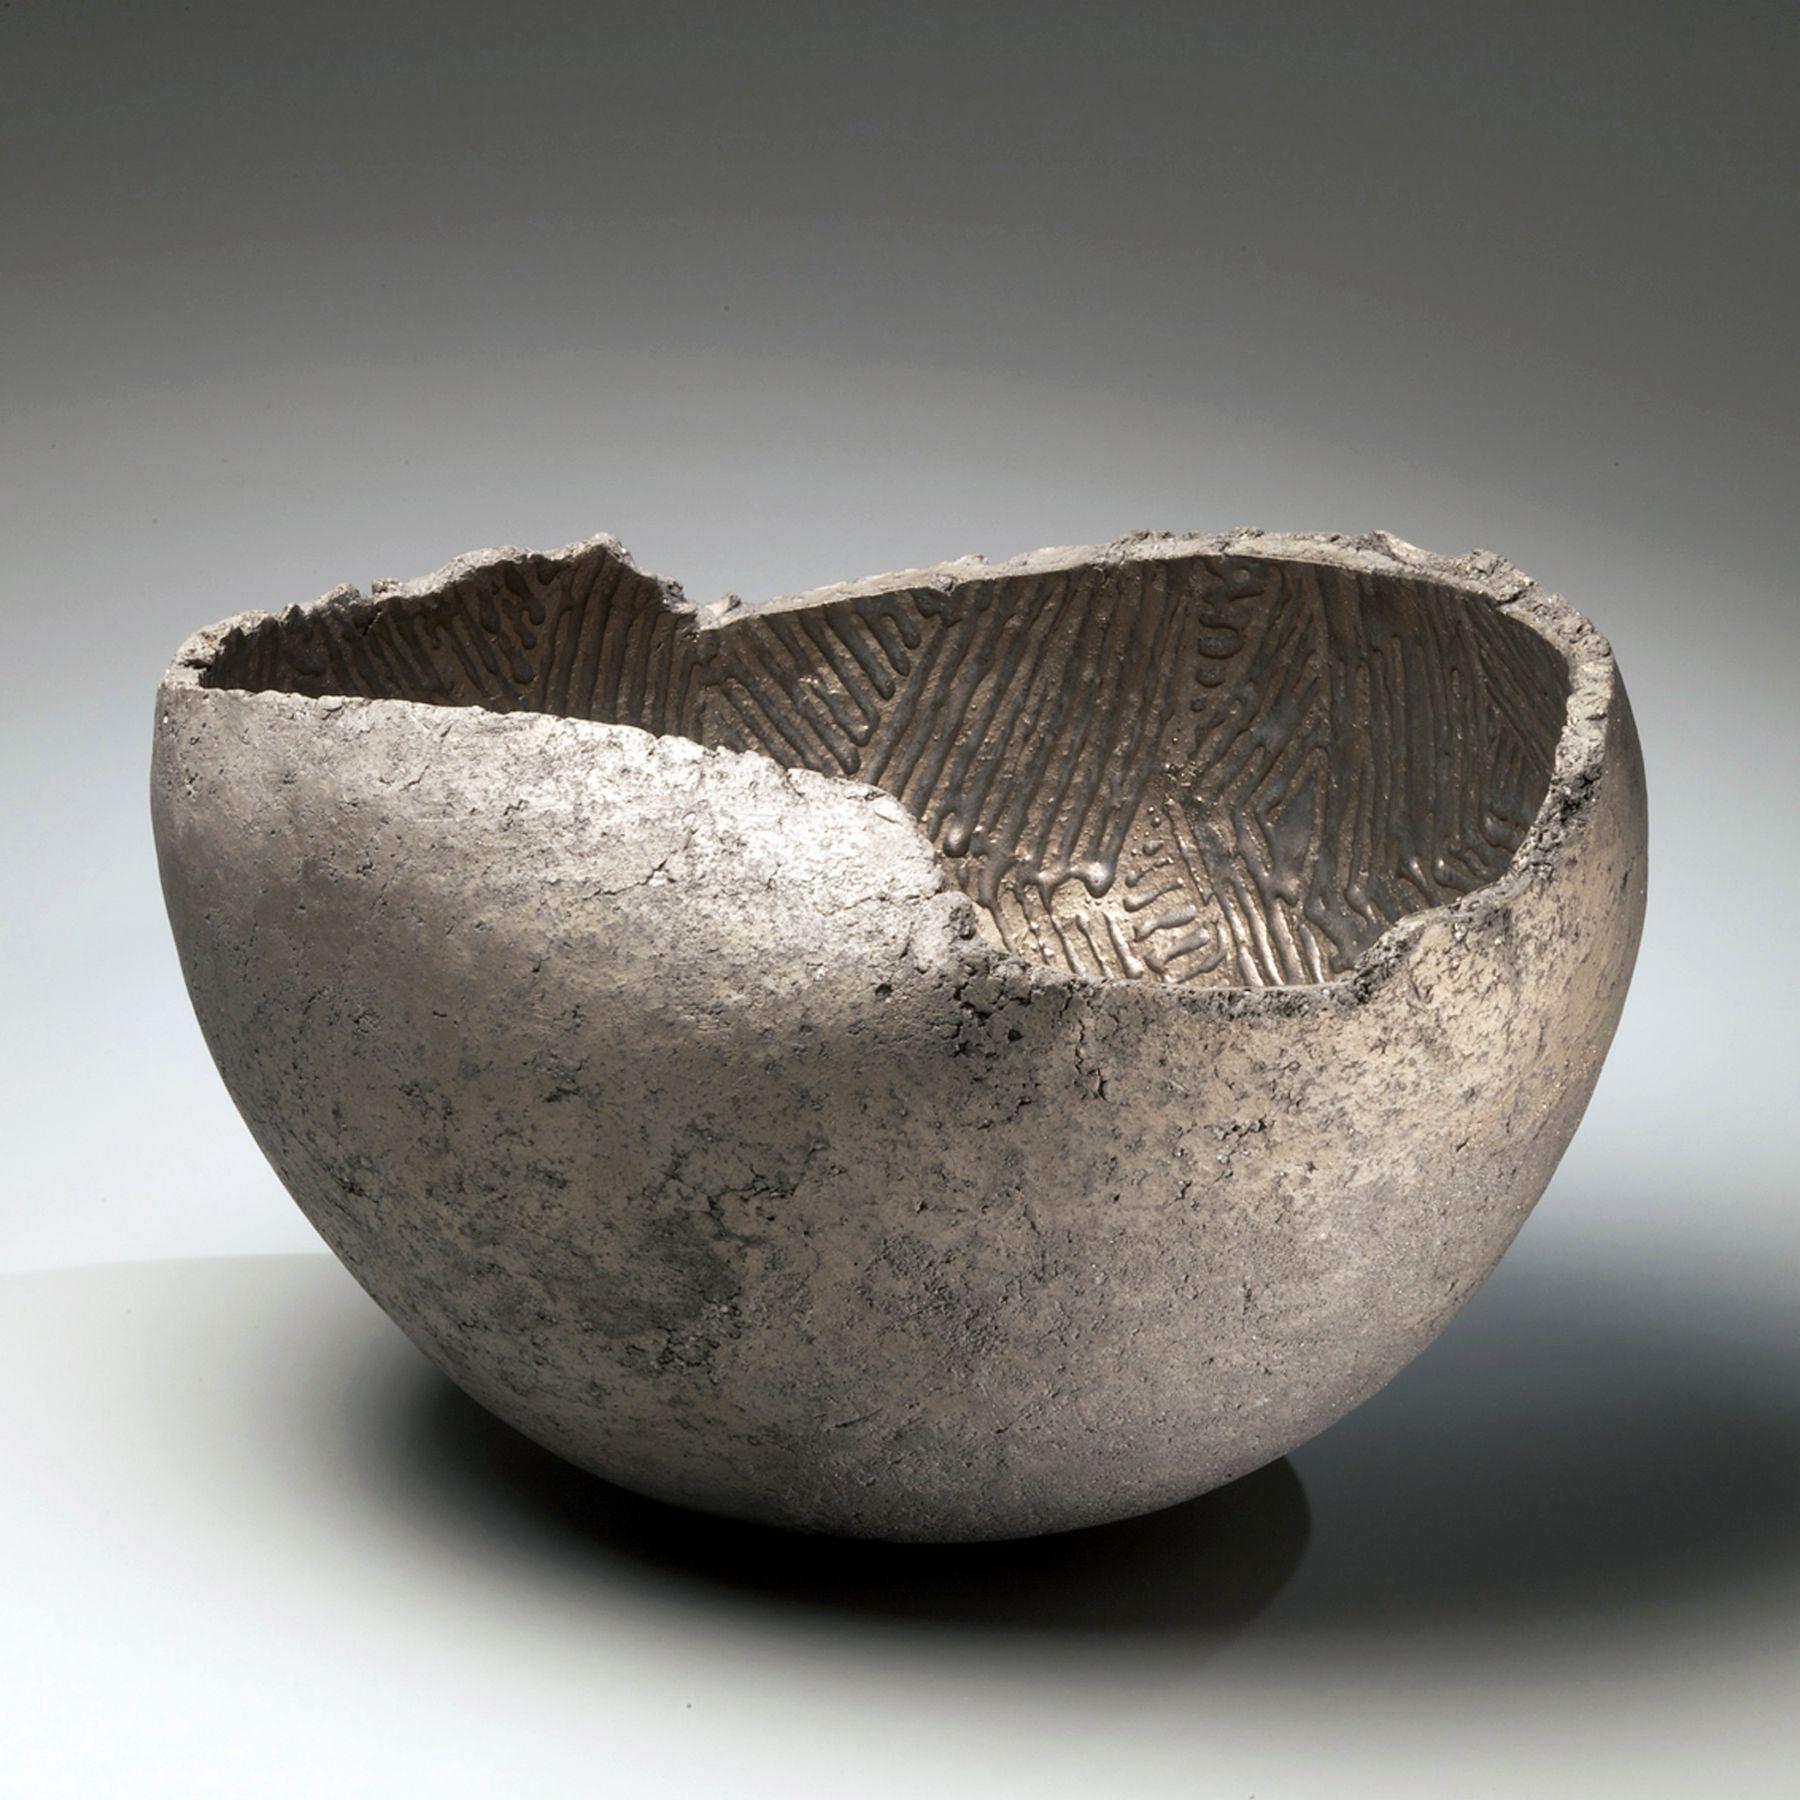 Ogawa Machiko, Silver and platinum-glazed vessel, 2009. Glazed stoneware, Japanese modern, contemporary, ceramics, sculpture